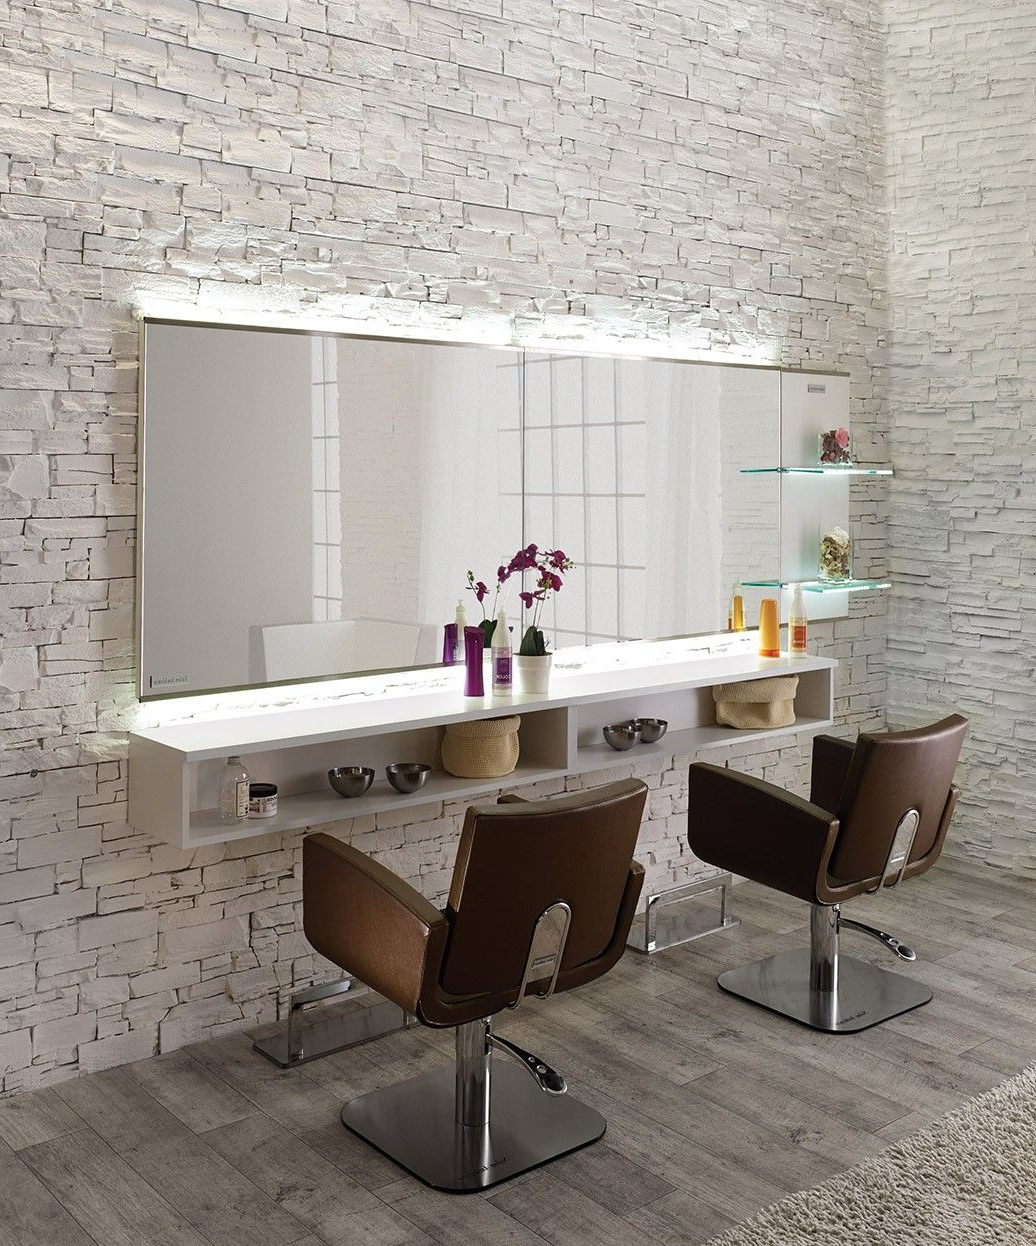 Salon Ambience Horizon Mirror Styling Station W/ Storage Throughout 2020 Salon Wall Mirrors (View 17 of 20)